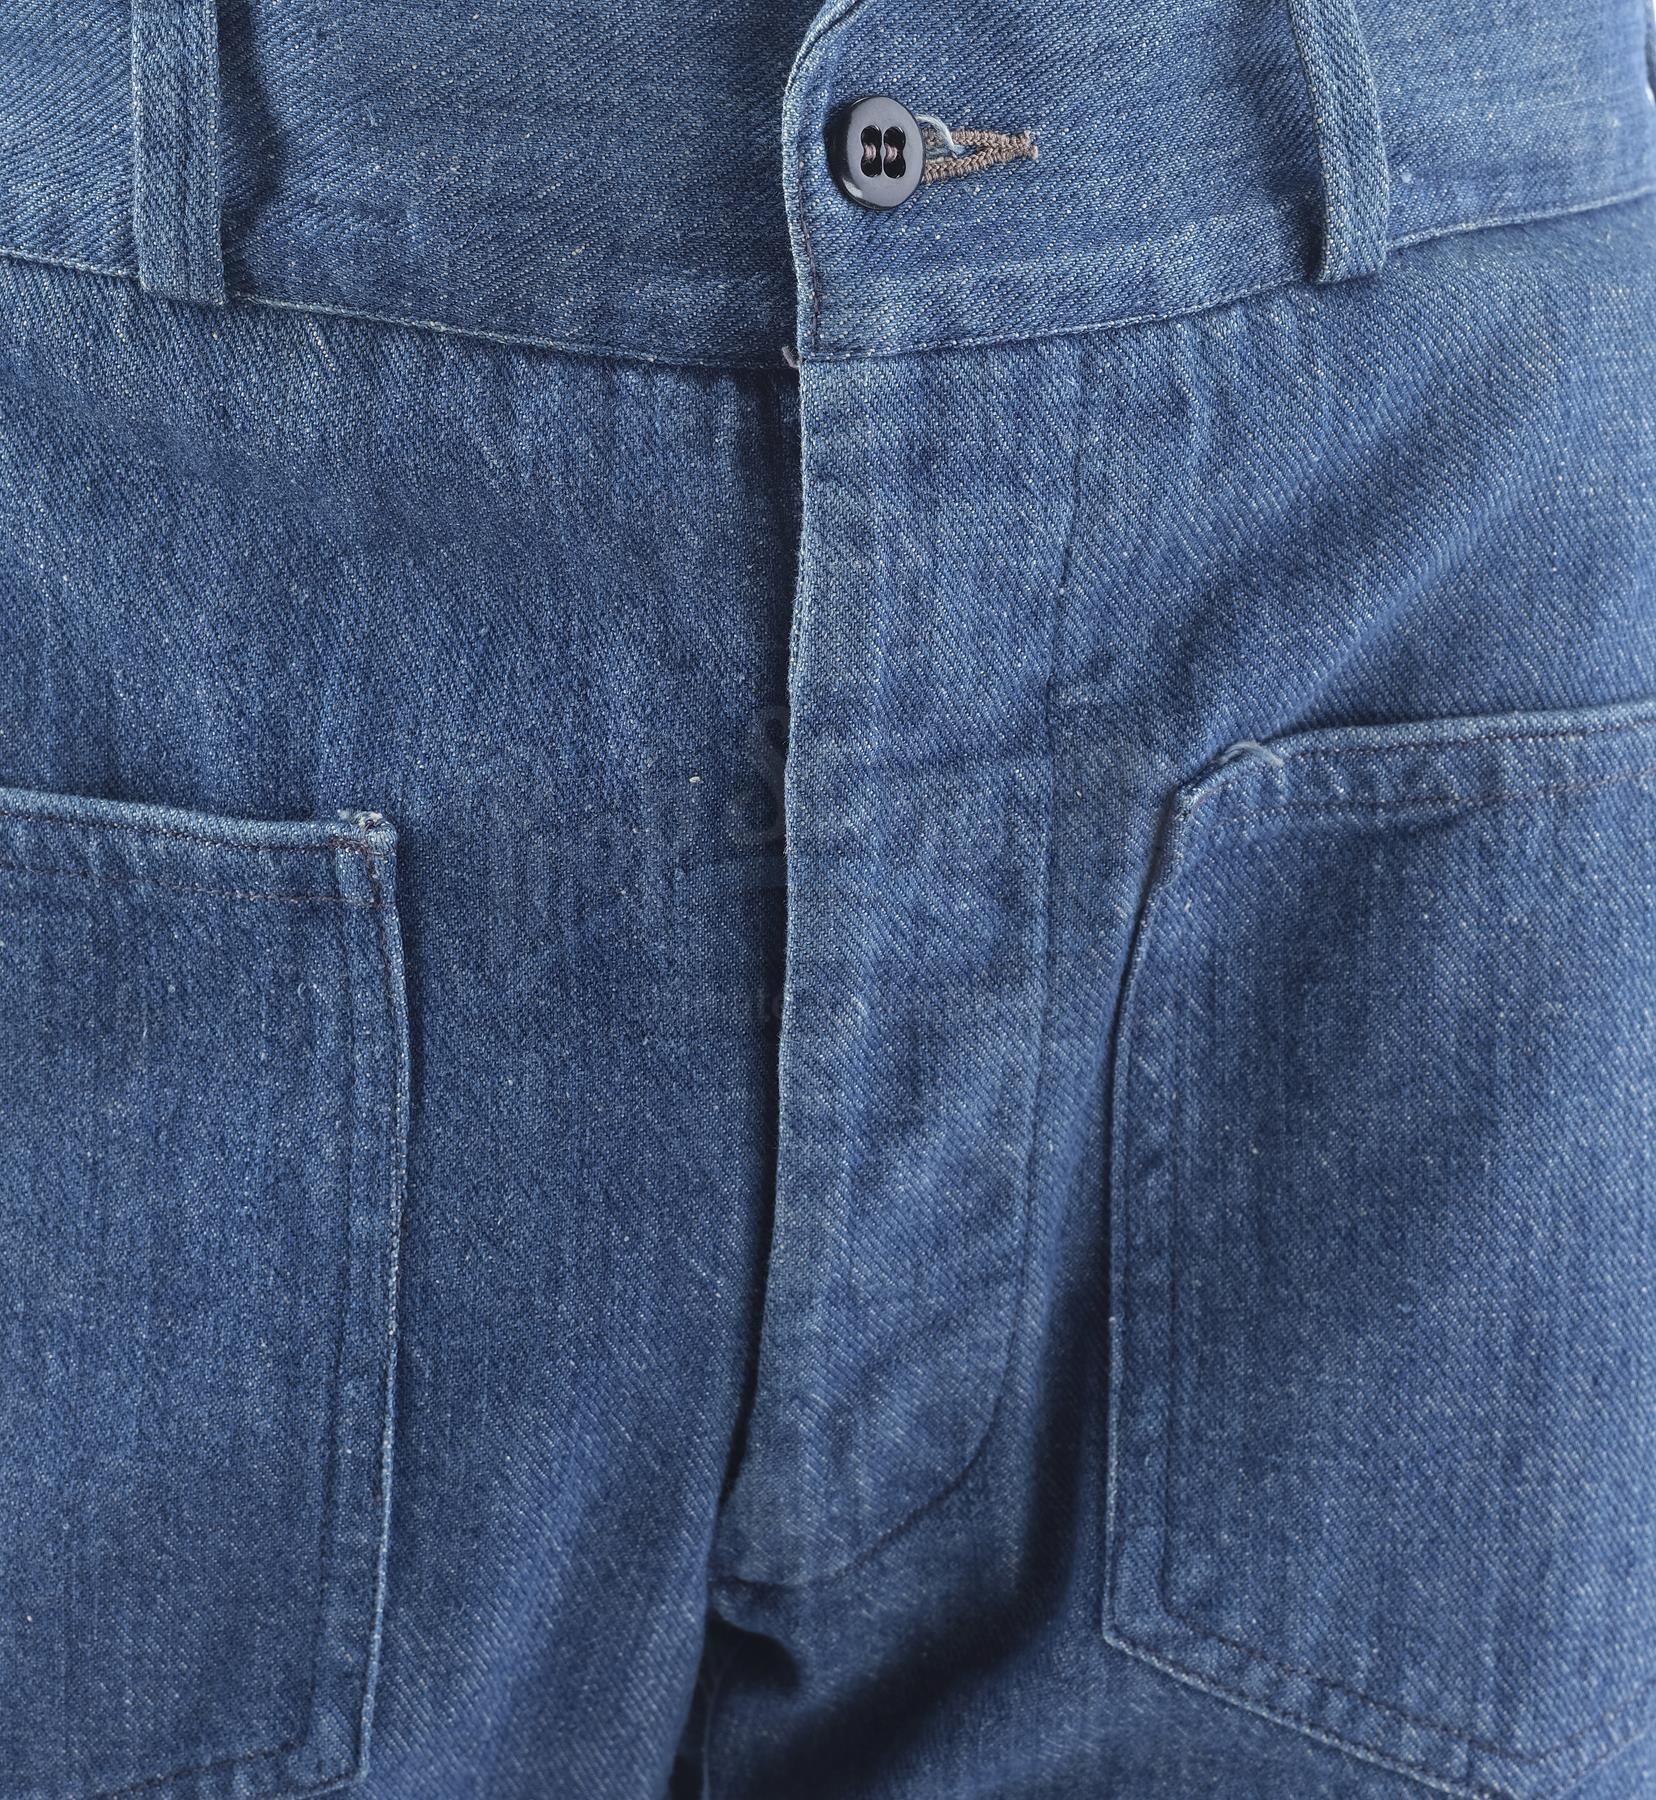 Lot # 1005: THE SAND PEBBLES - Jake Holman's (Steve McQueen) Jeans - Image 6 of 11